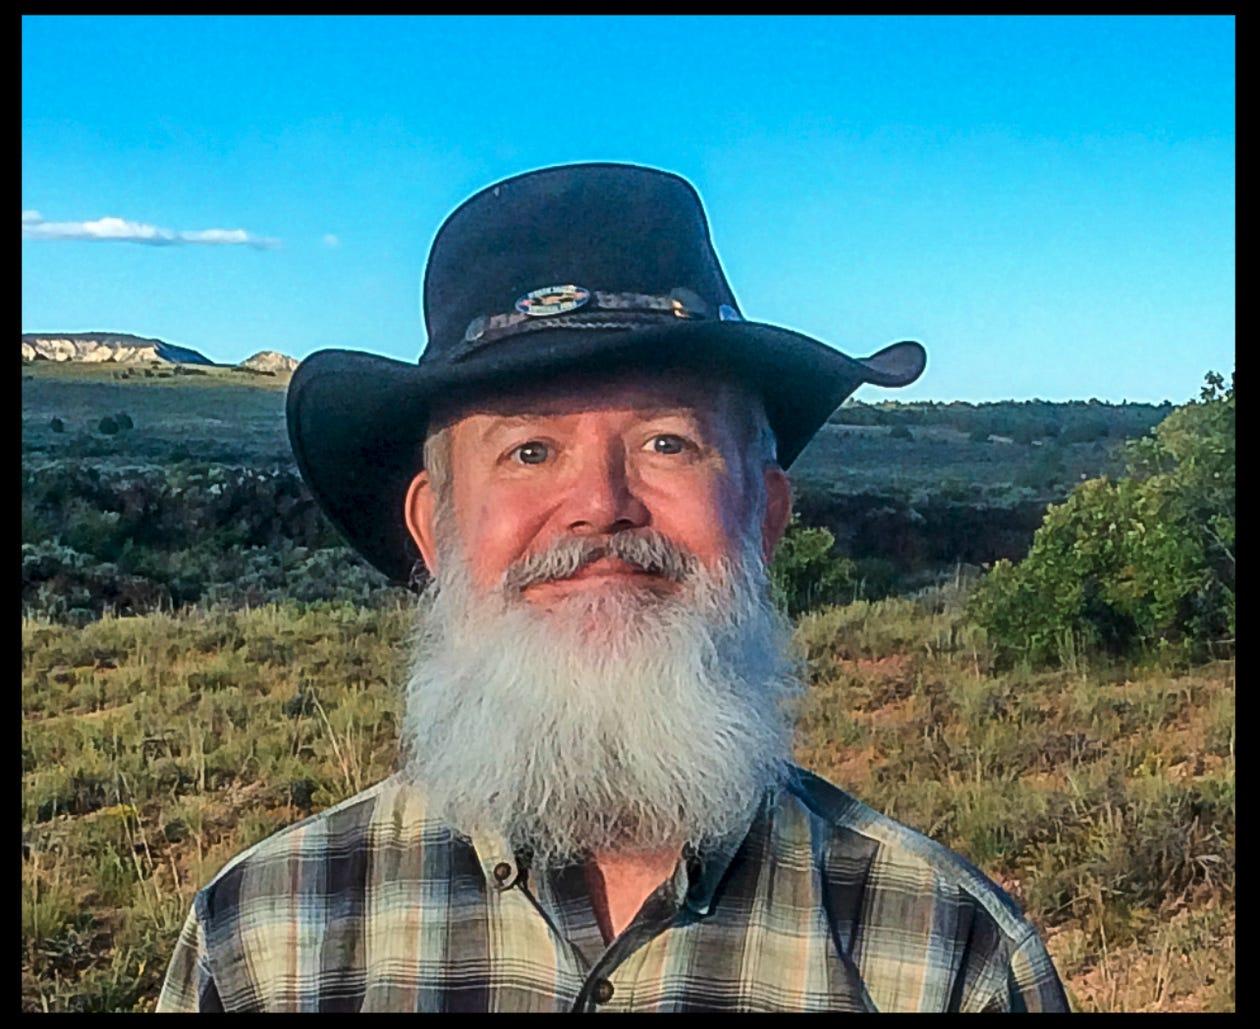 John Robert Krampf del canal The Happy Scientist